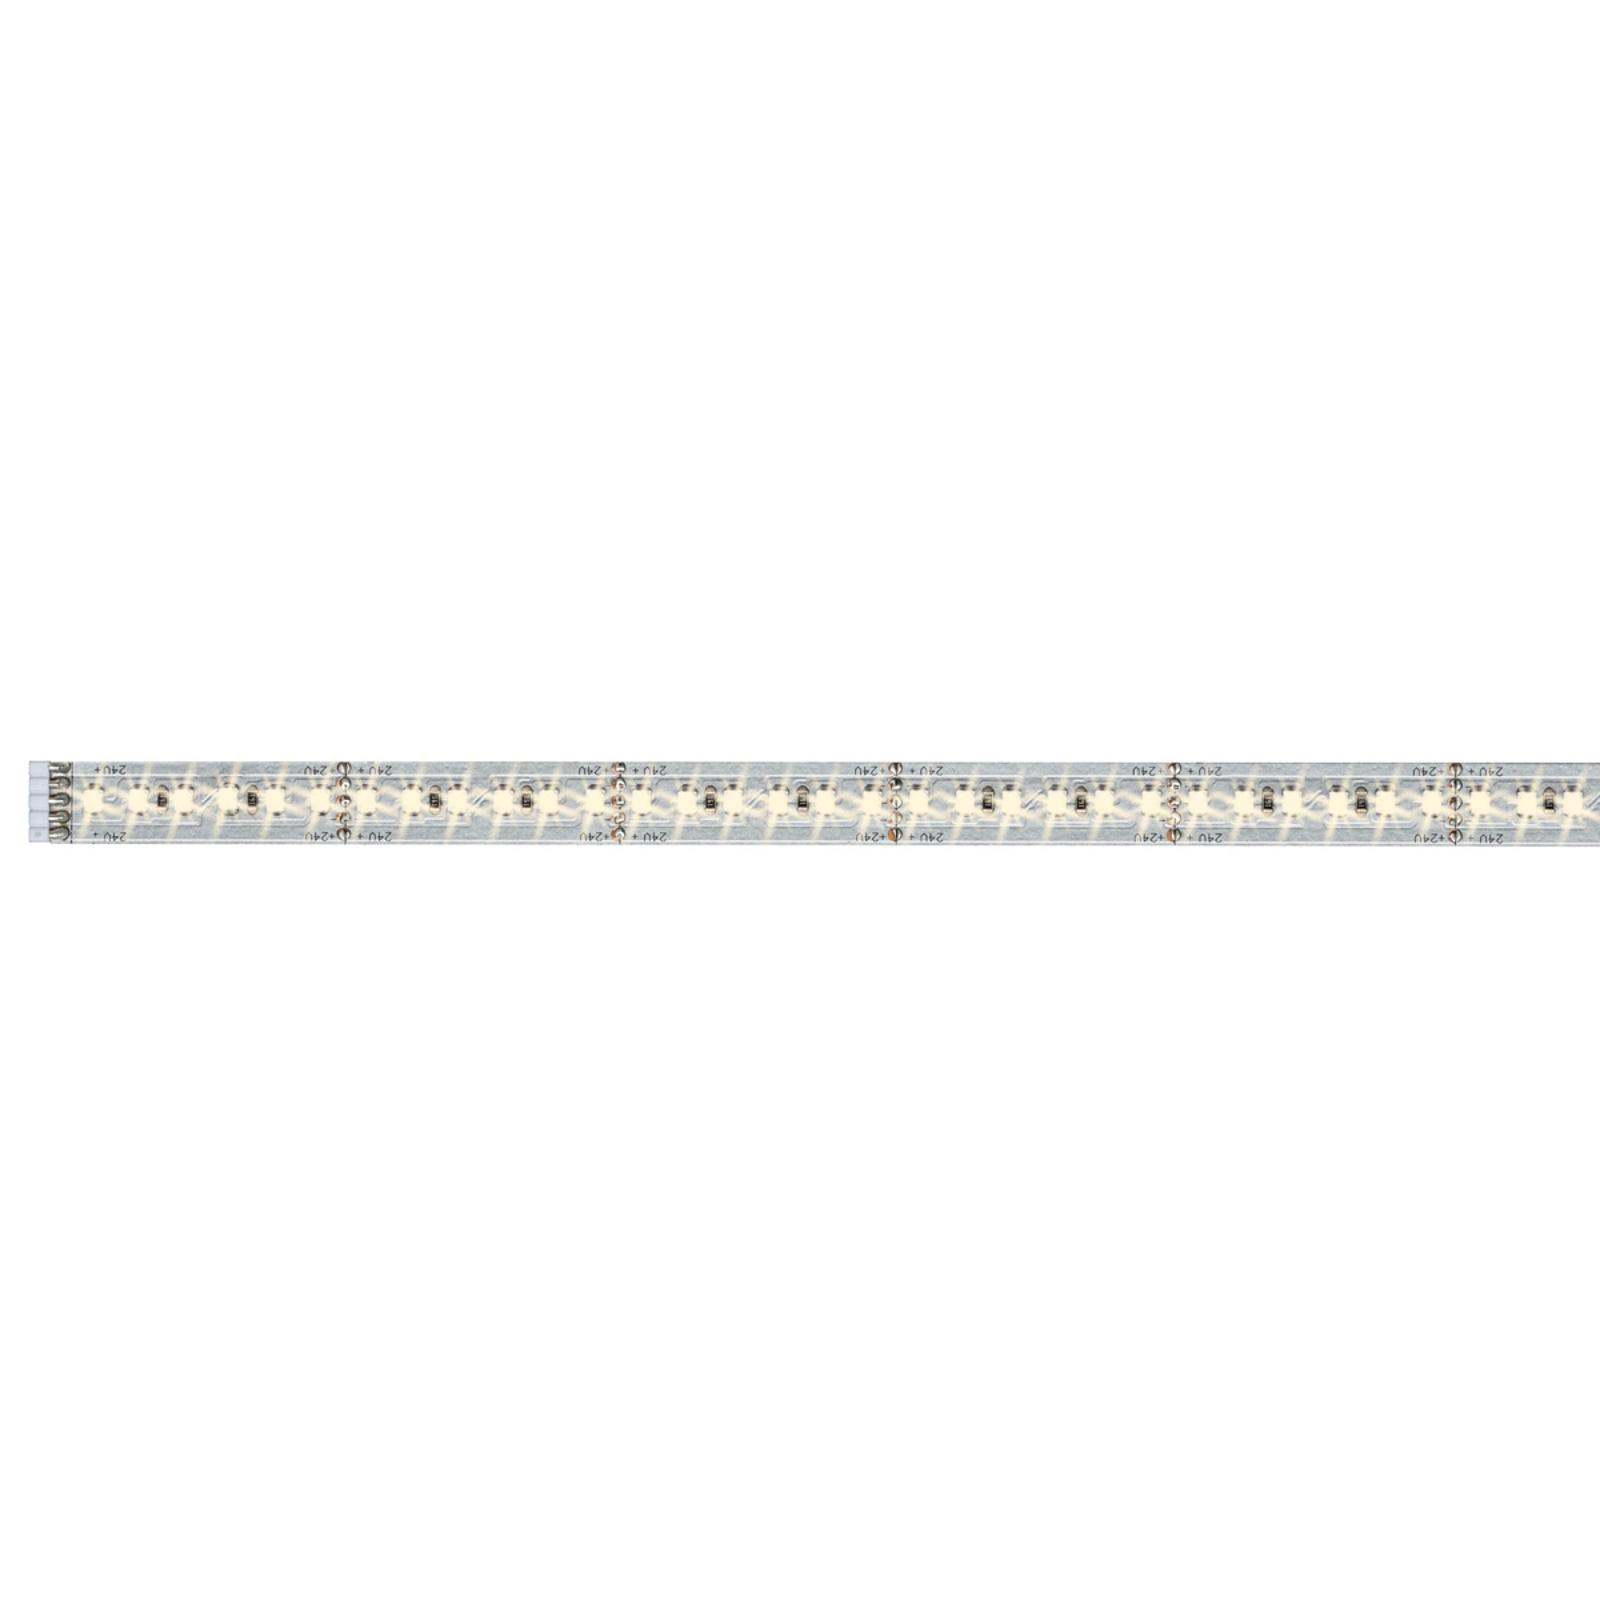 Paulmann MaxLED 1000 LED-Strip Erweiterung 1m WW